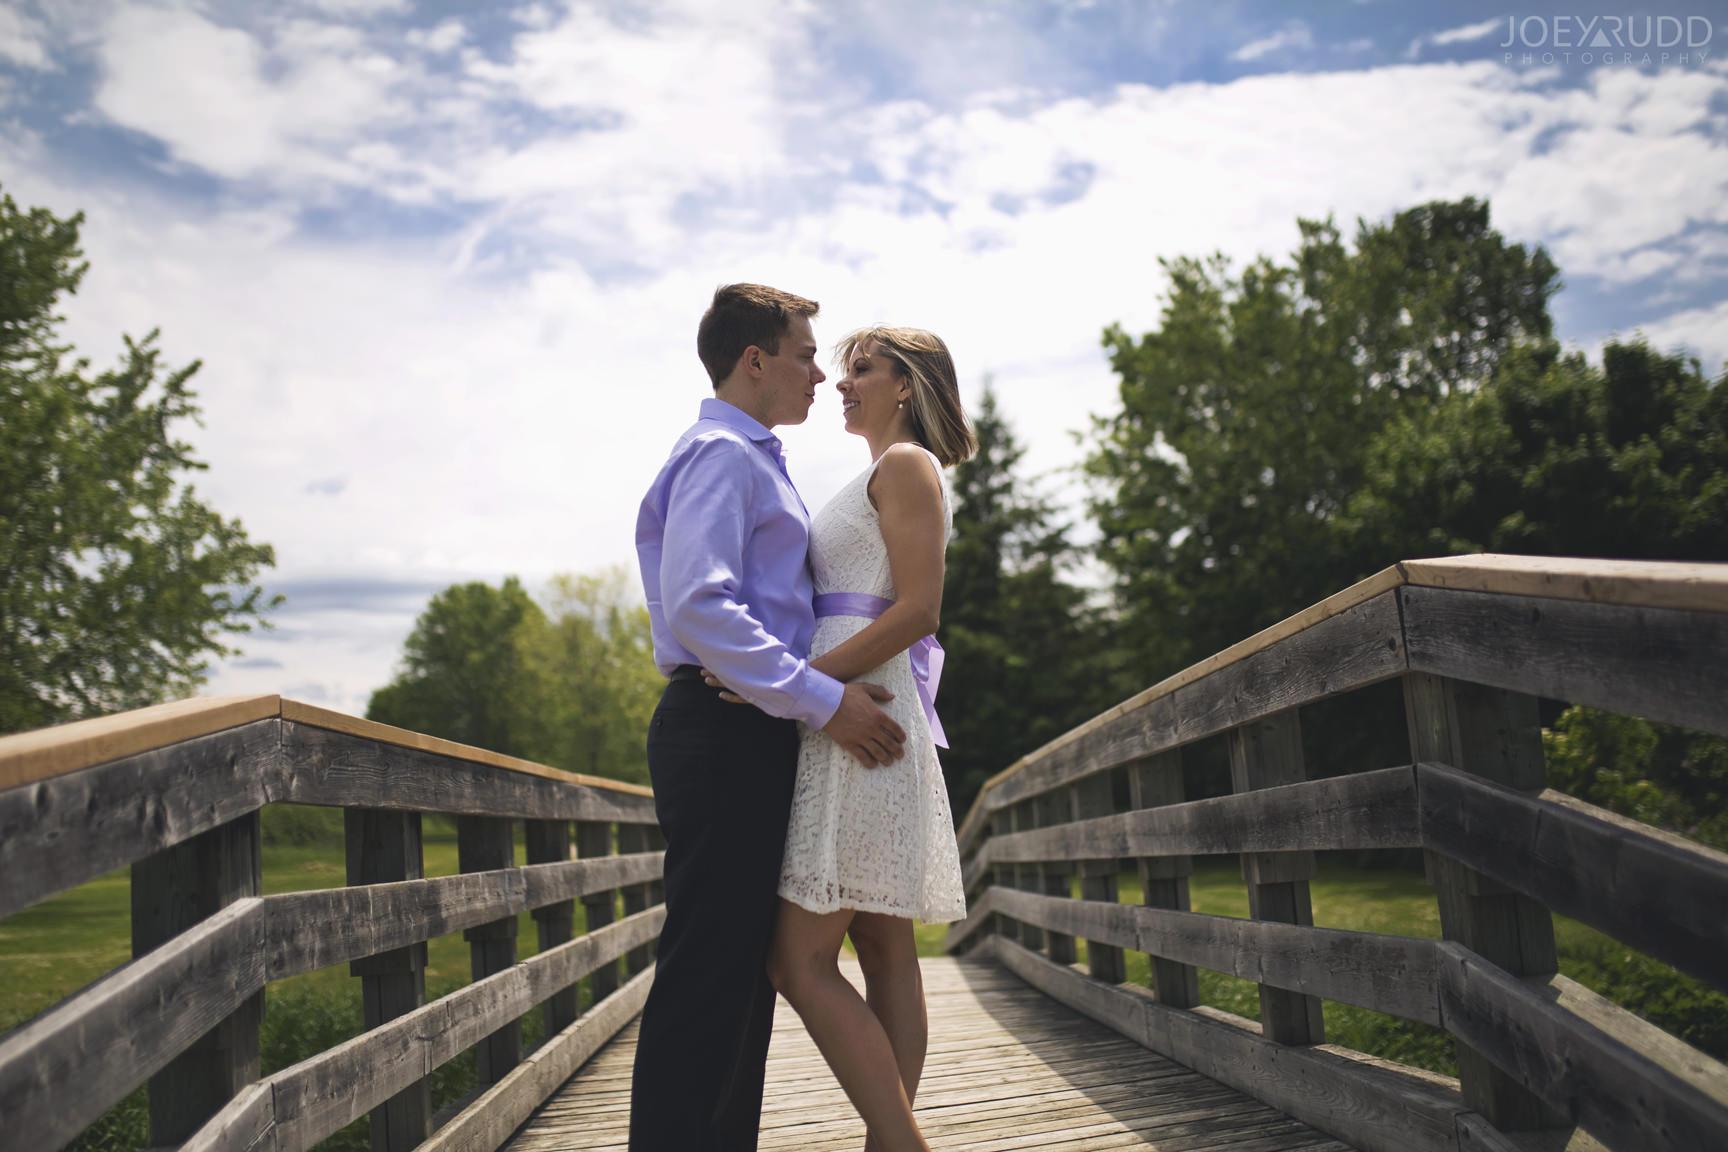 Elopement Wedding Ottawa Photographer Elope Photography Joey Rudd Photographer Bridge